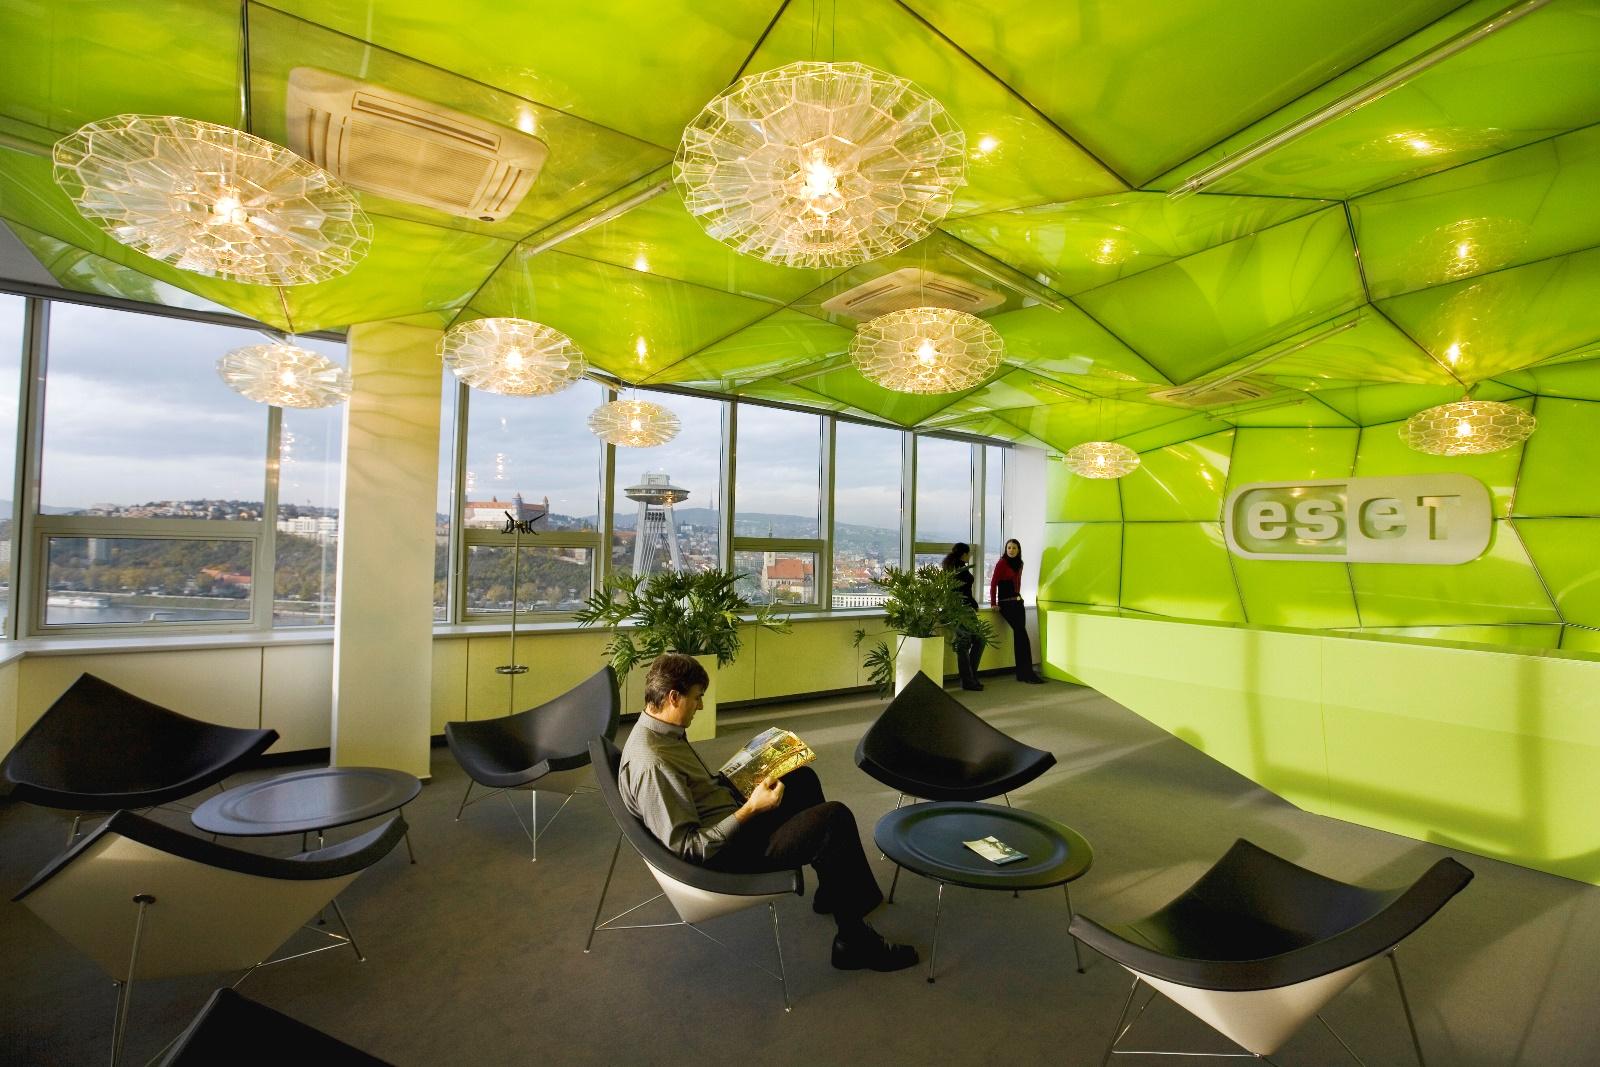 ESET's head office in Slovakia